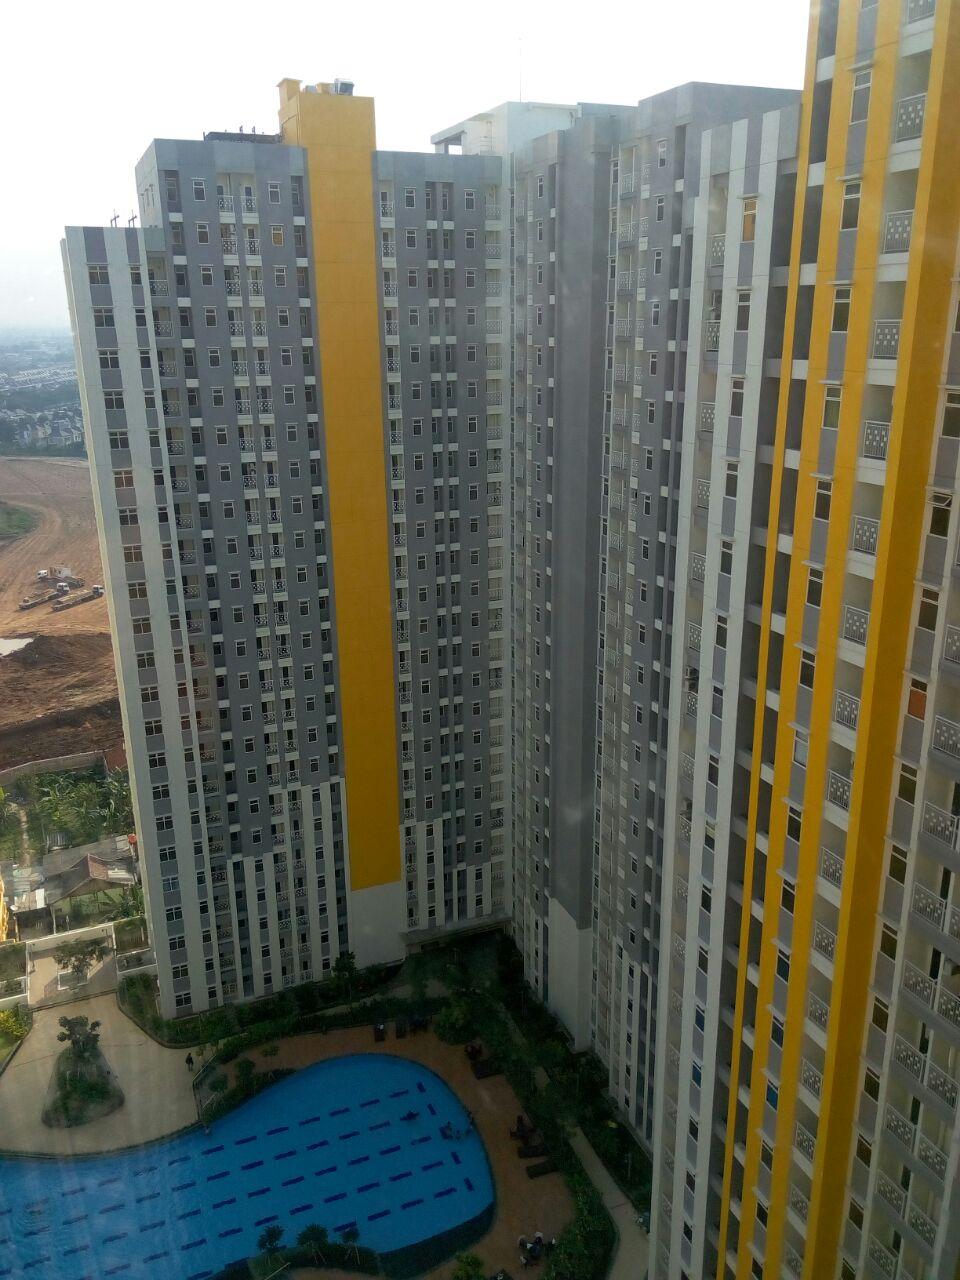 Disewakan Apartment Springlake Summarecon Bekasi Type 2 BR Tower Basella Lt.17 No.27 Cuma 20 Juta/Tahun